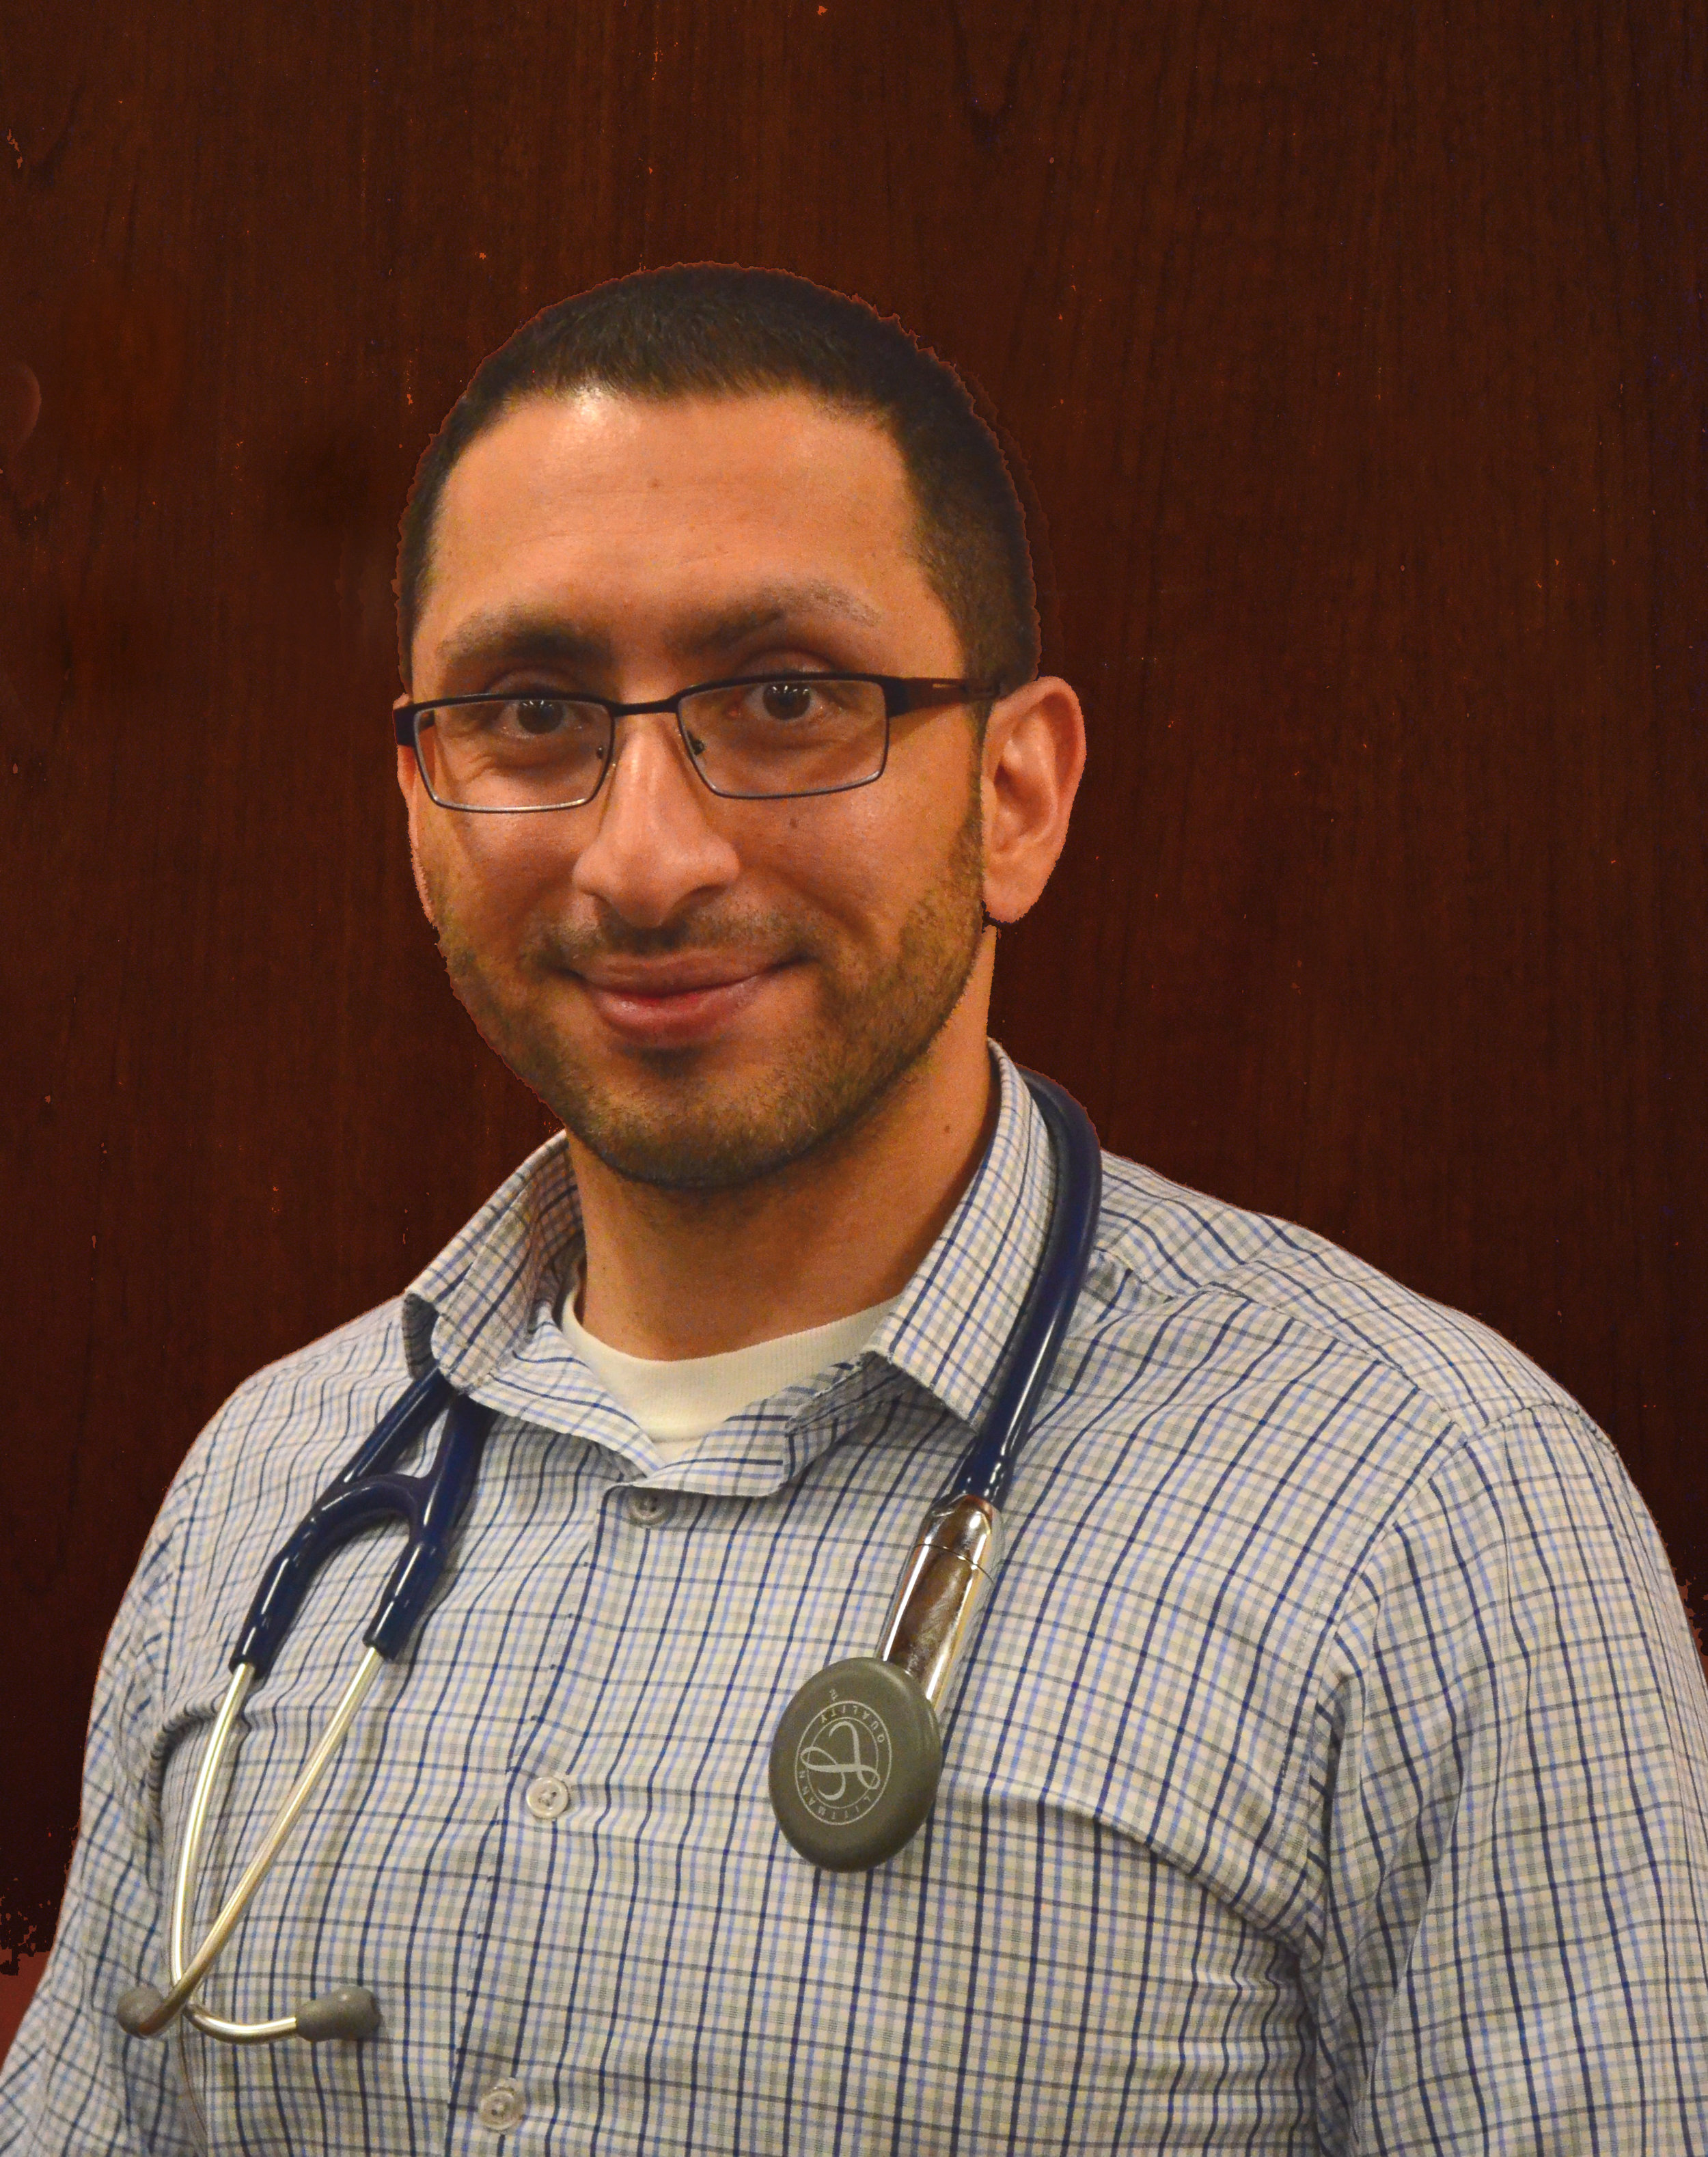 Dr. Tawfik Hamati